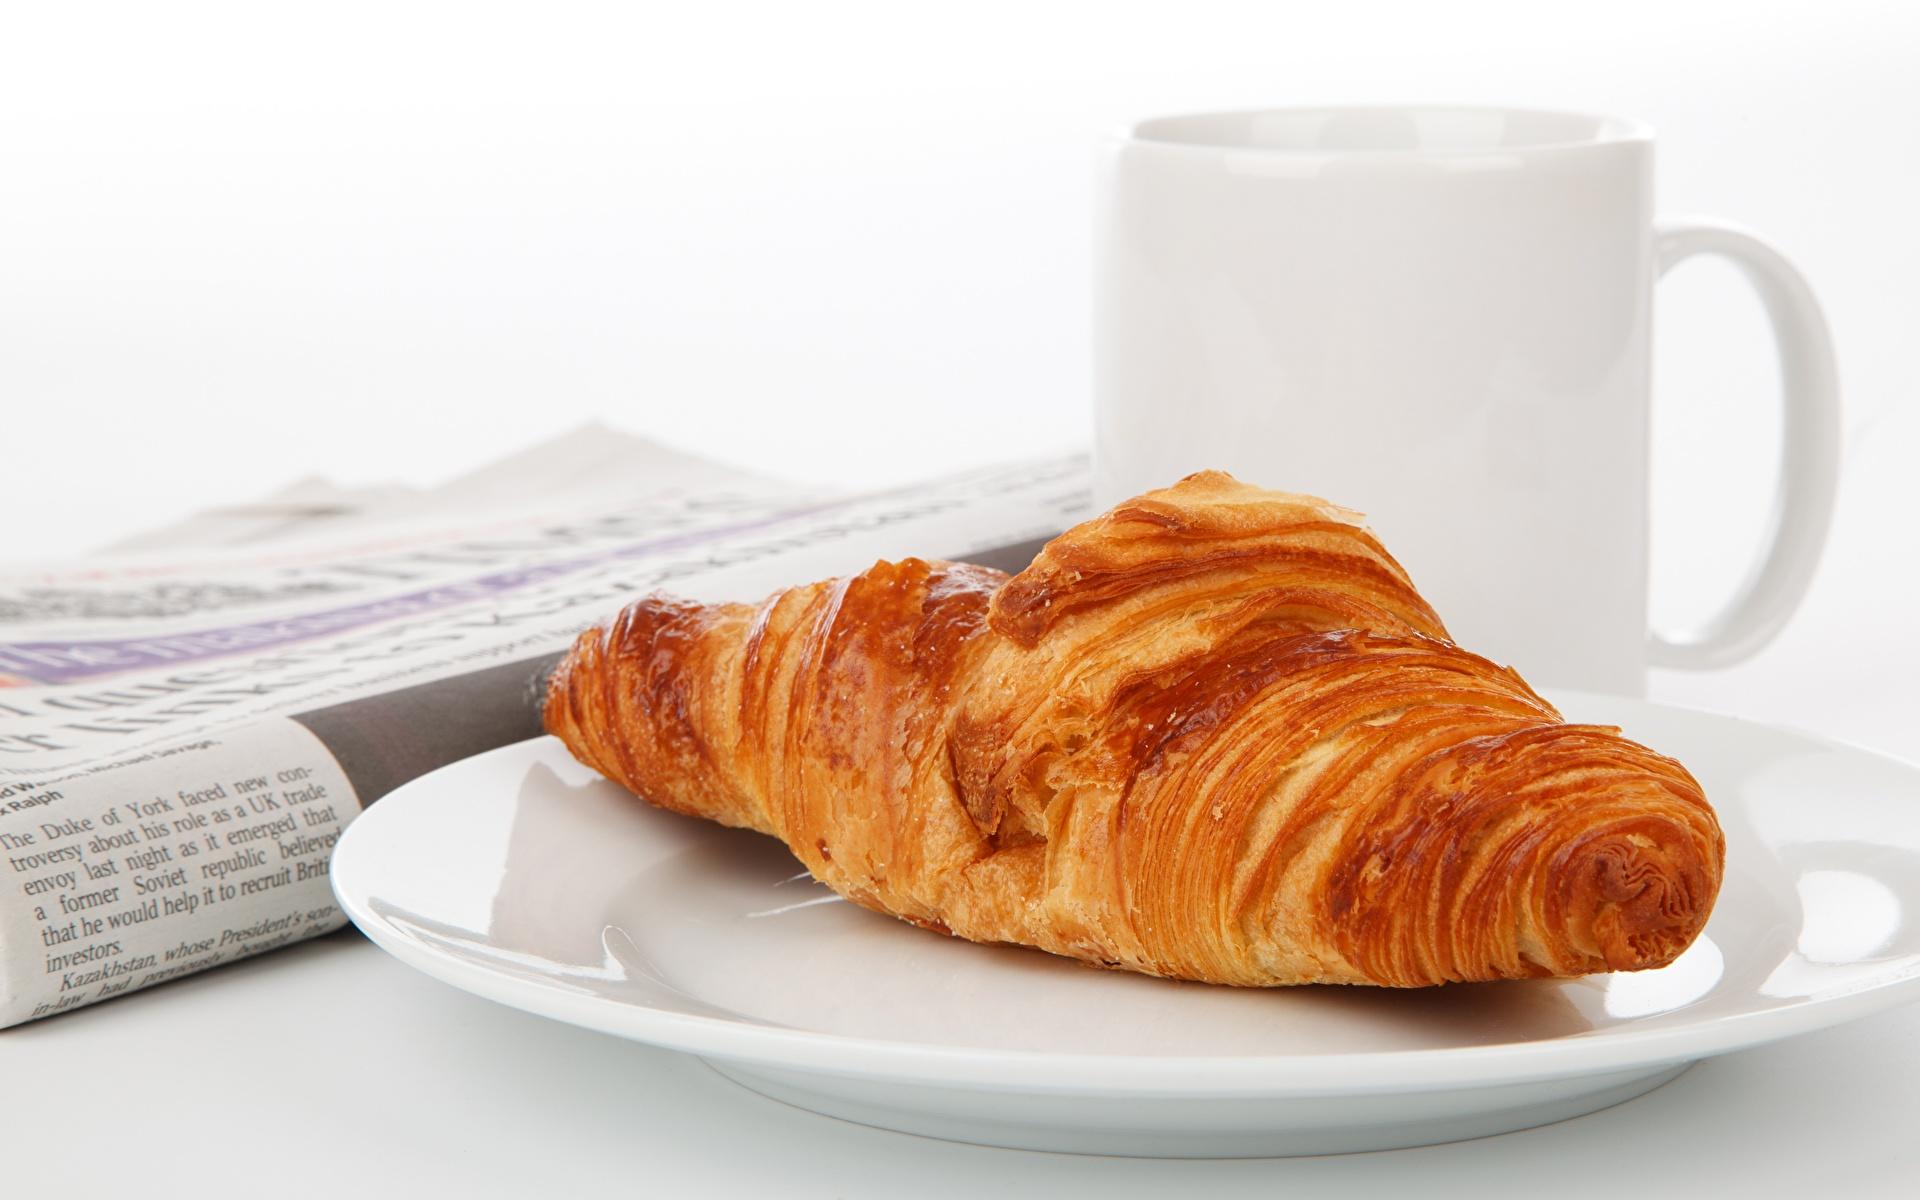 Fotos Croissant Teller Becher Lebensmittel Großansicht 1920x1200 das Essen hautnah Nahaufnahme